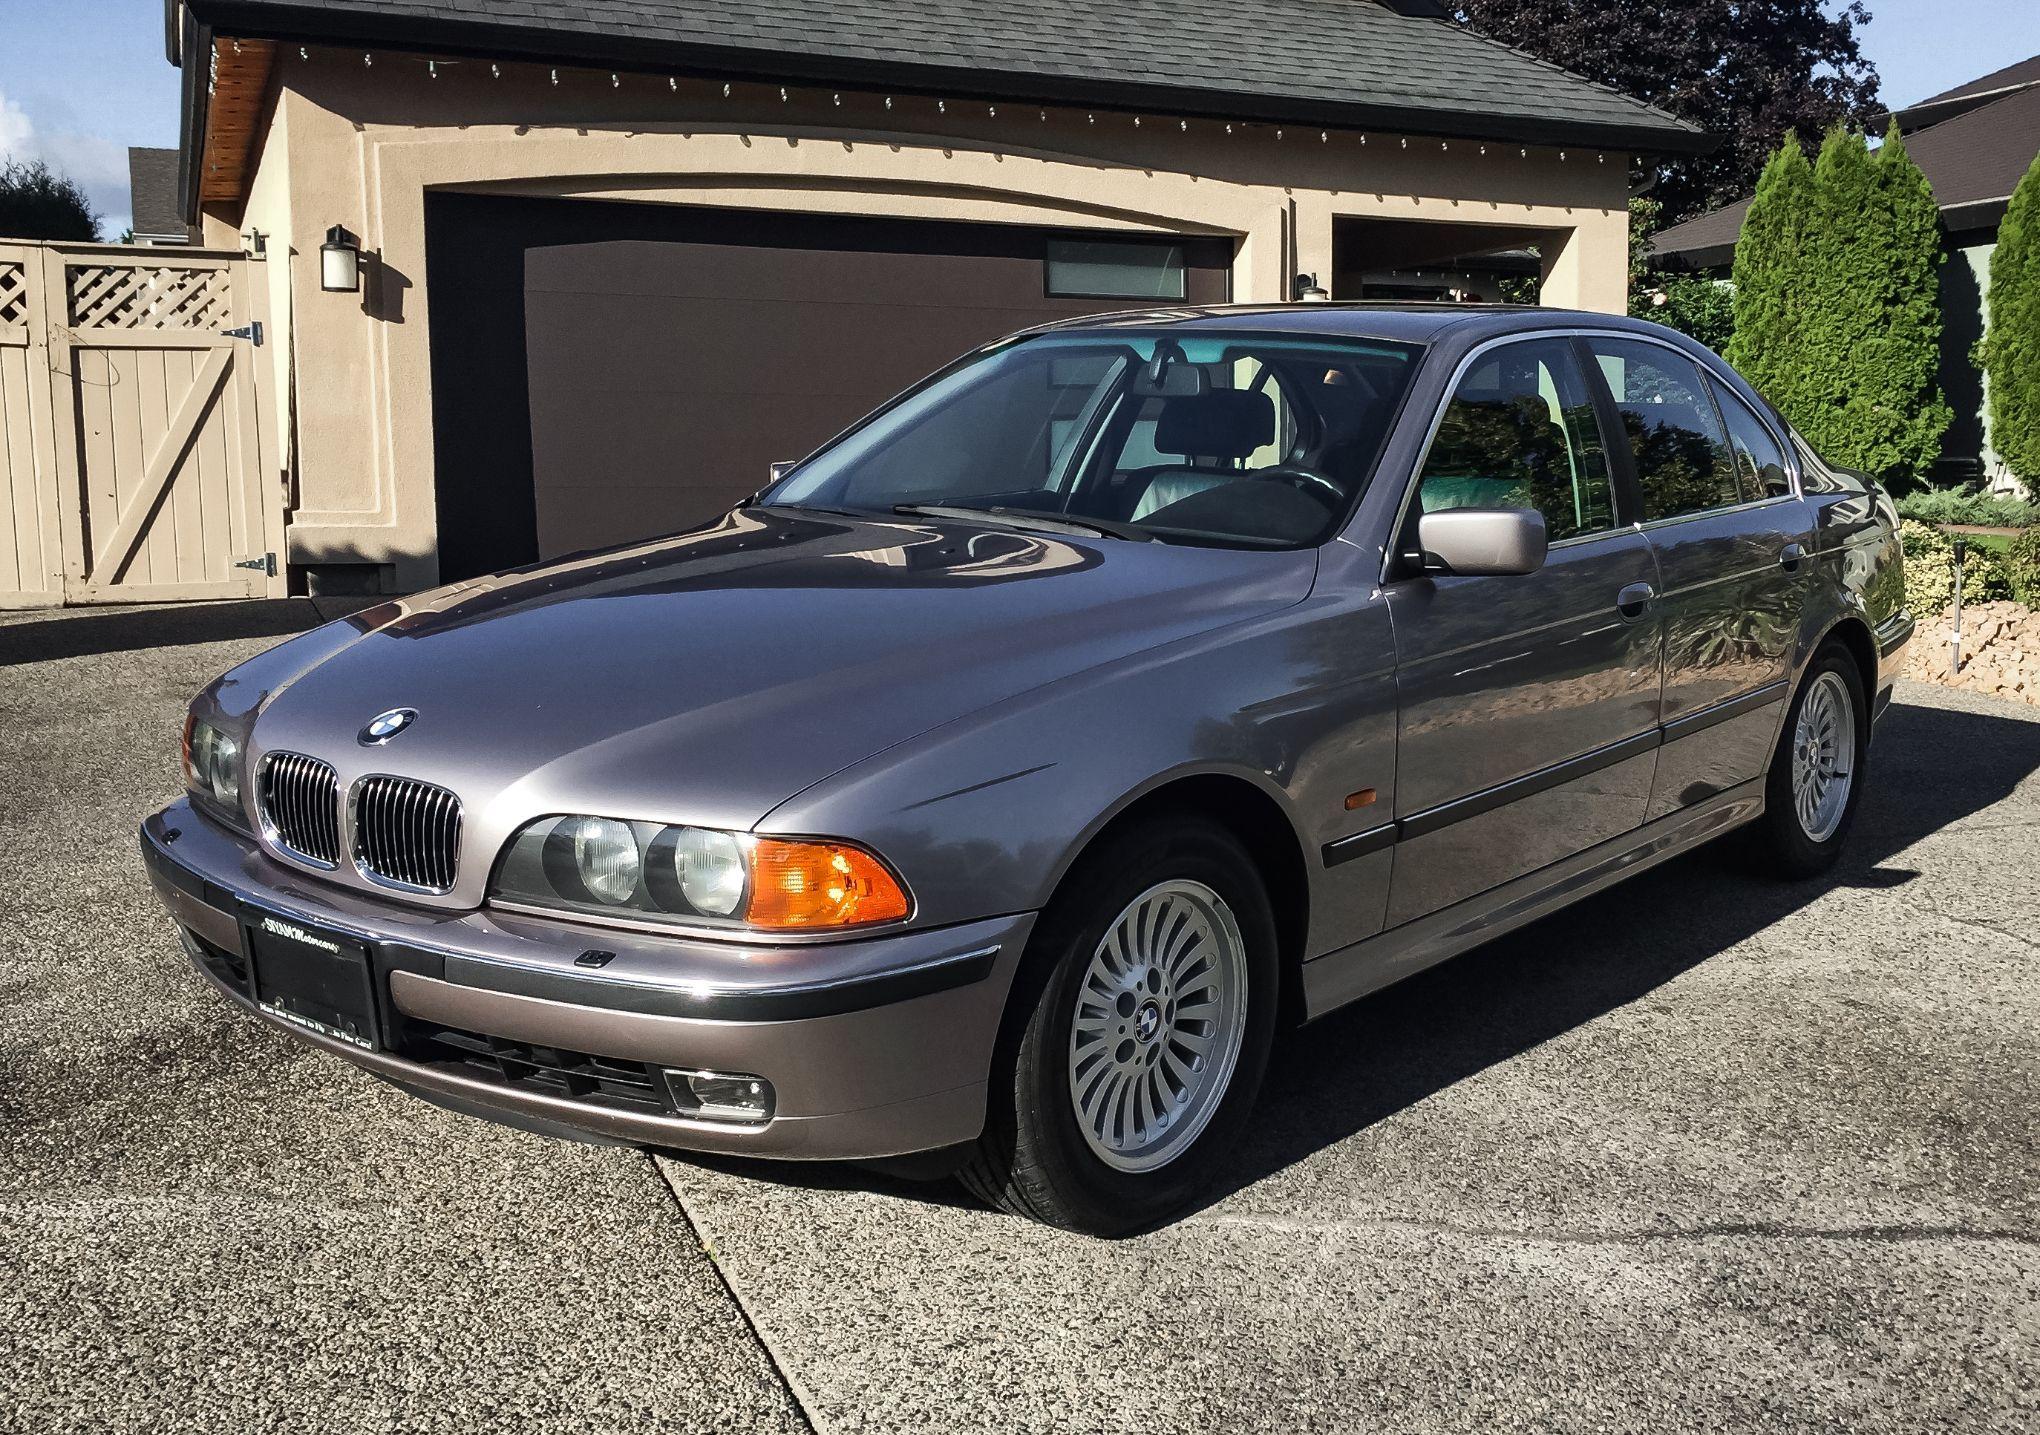 1997 Bmw 540i Aspen Silver Vin Wbade6329vbw56158 Classic Com